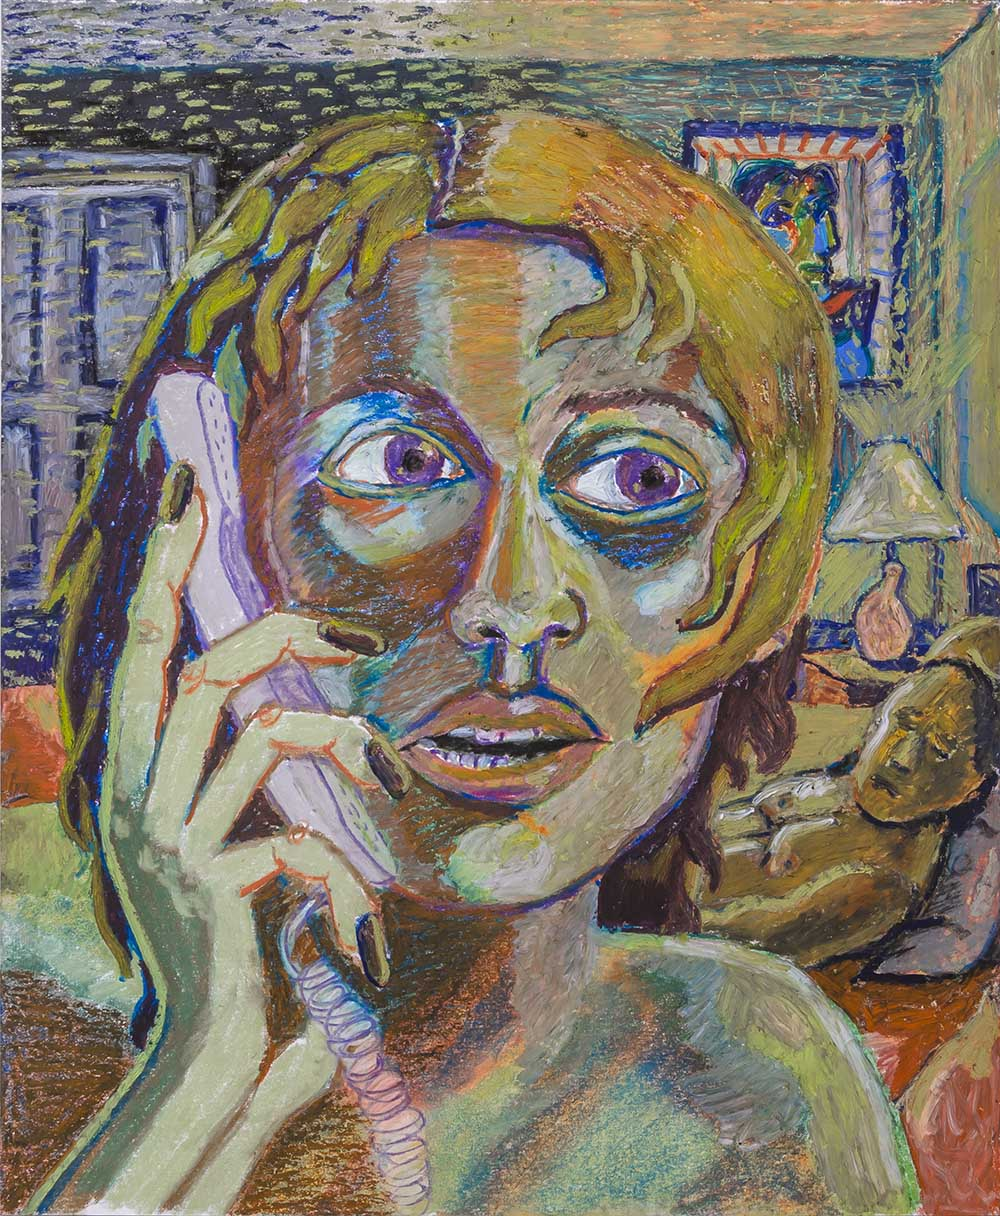 "Bruna Massadas, Regina Says ""I Love You, Too"", 2015, Soft pastel & oil pastel on paper, 17 x 14 inches"